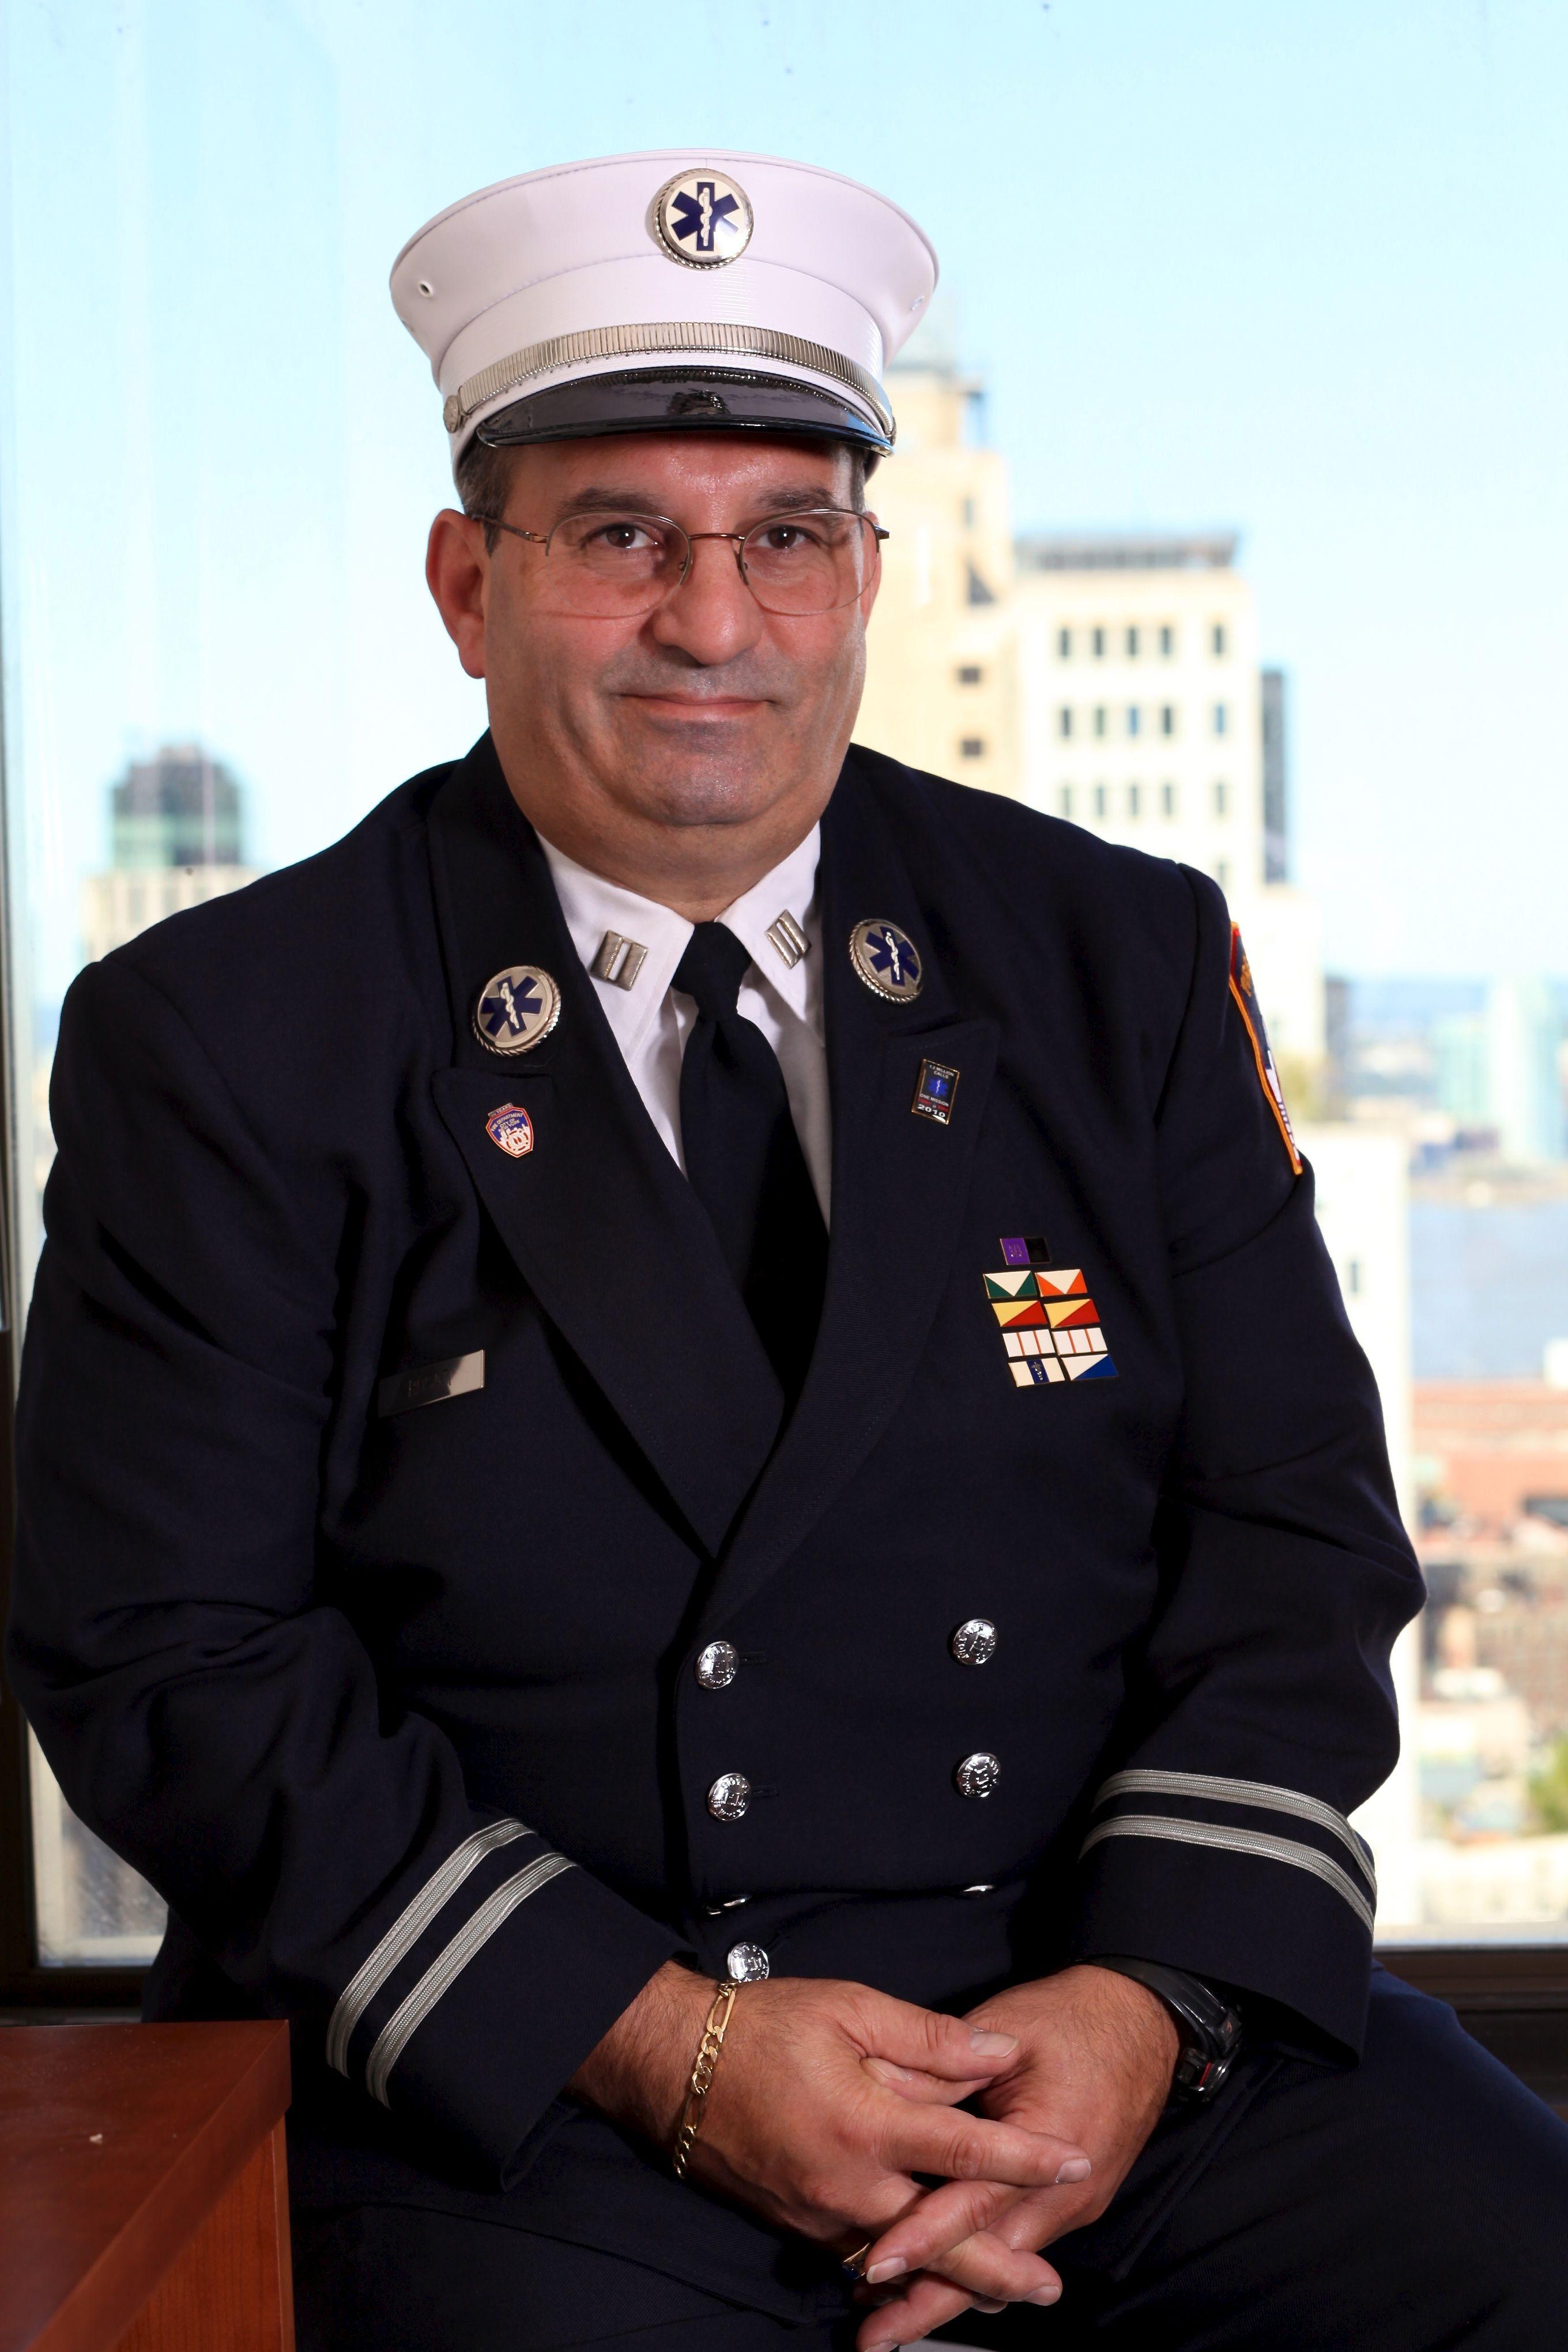 Vincent Rosati, Fire Department, 2,500 Award Service